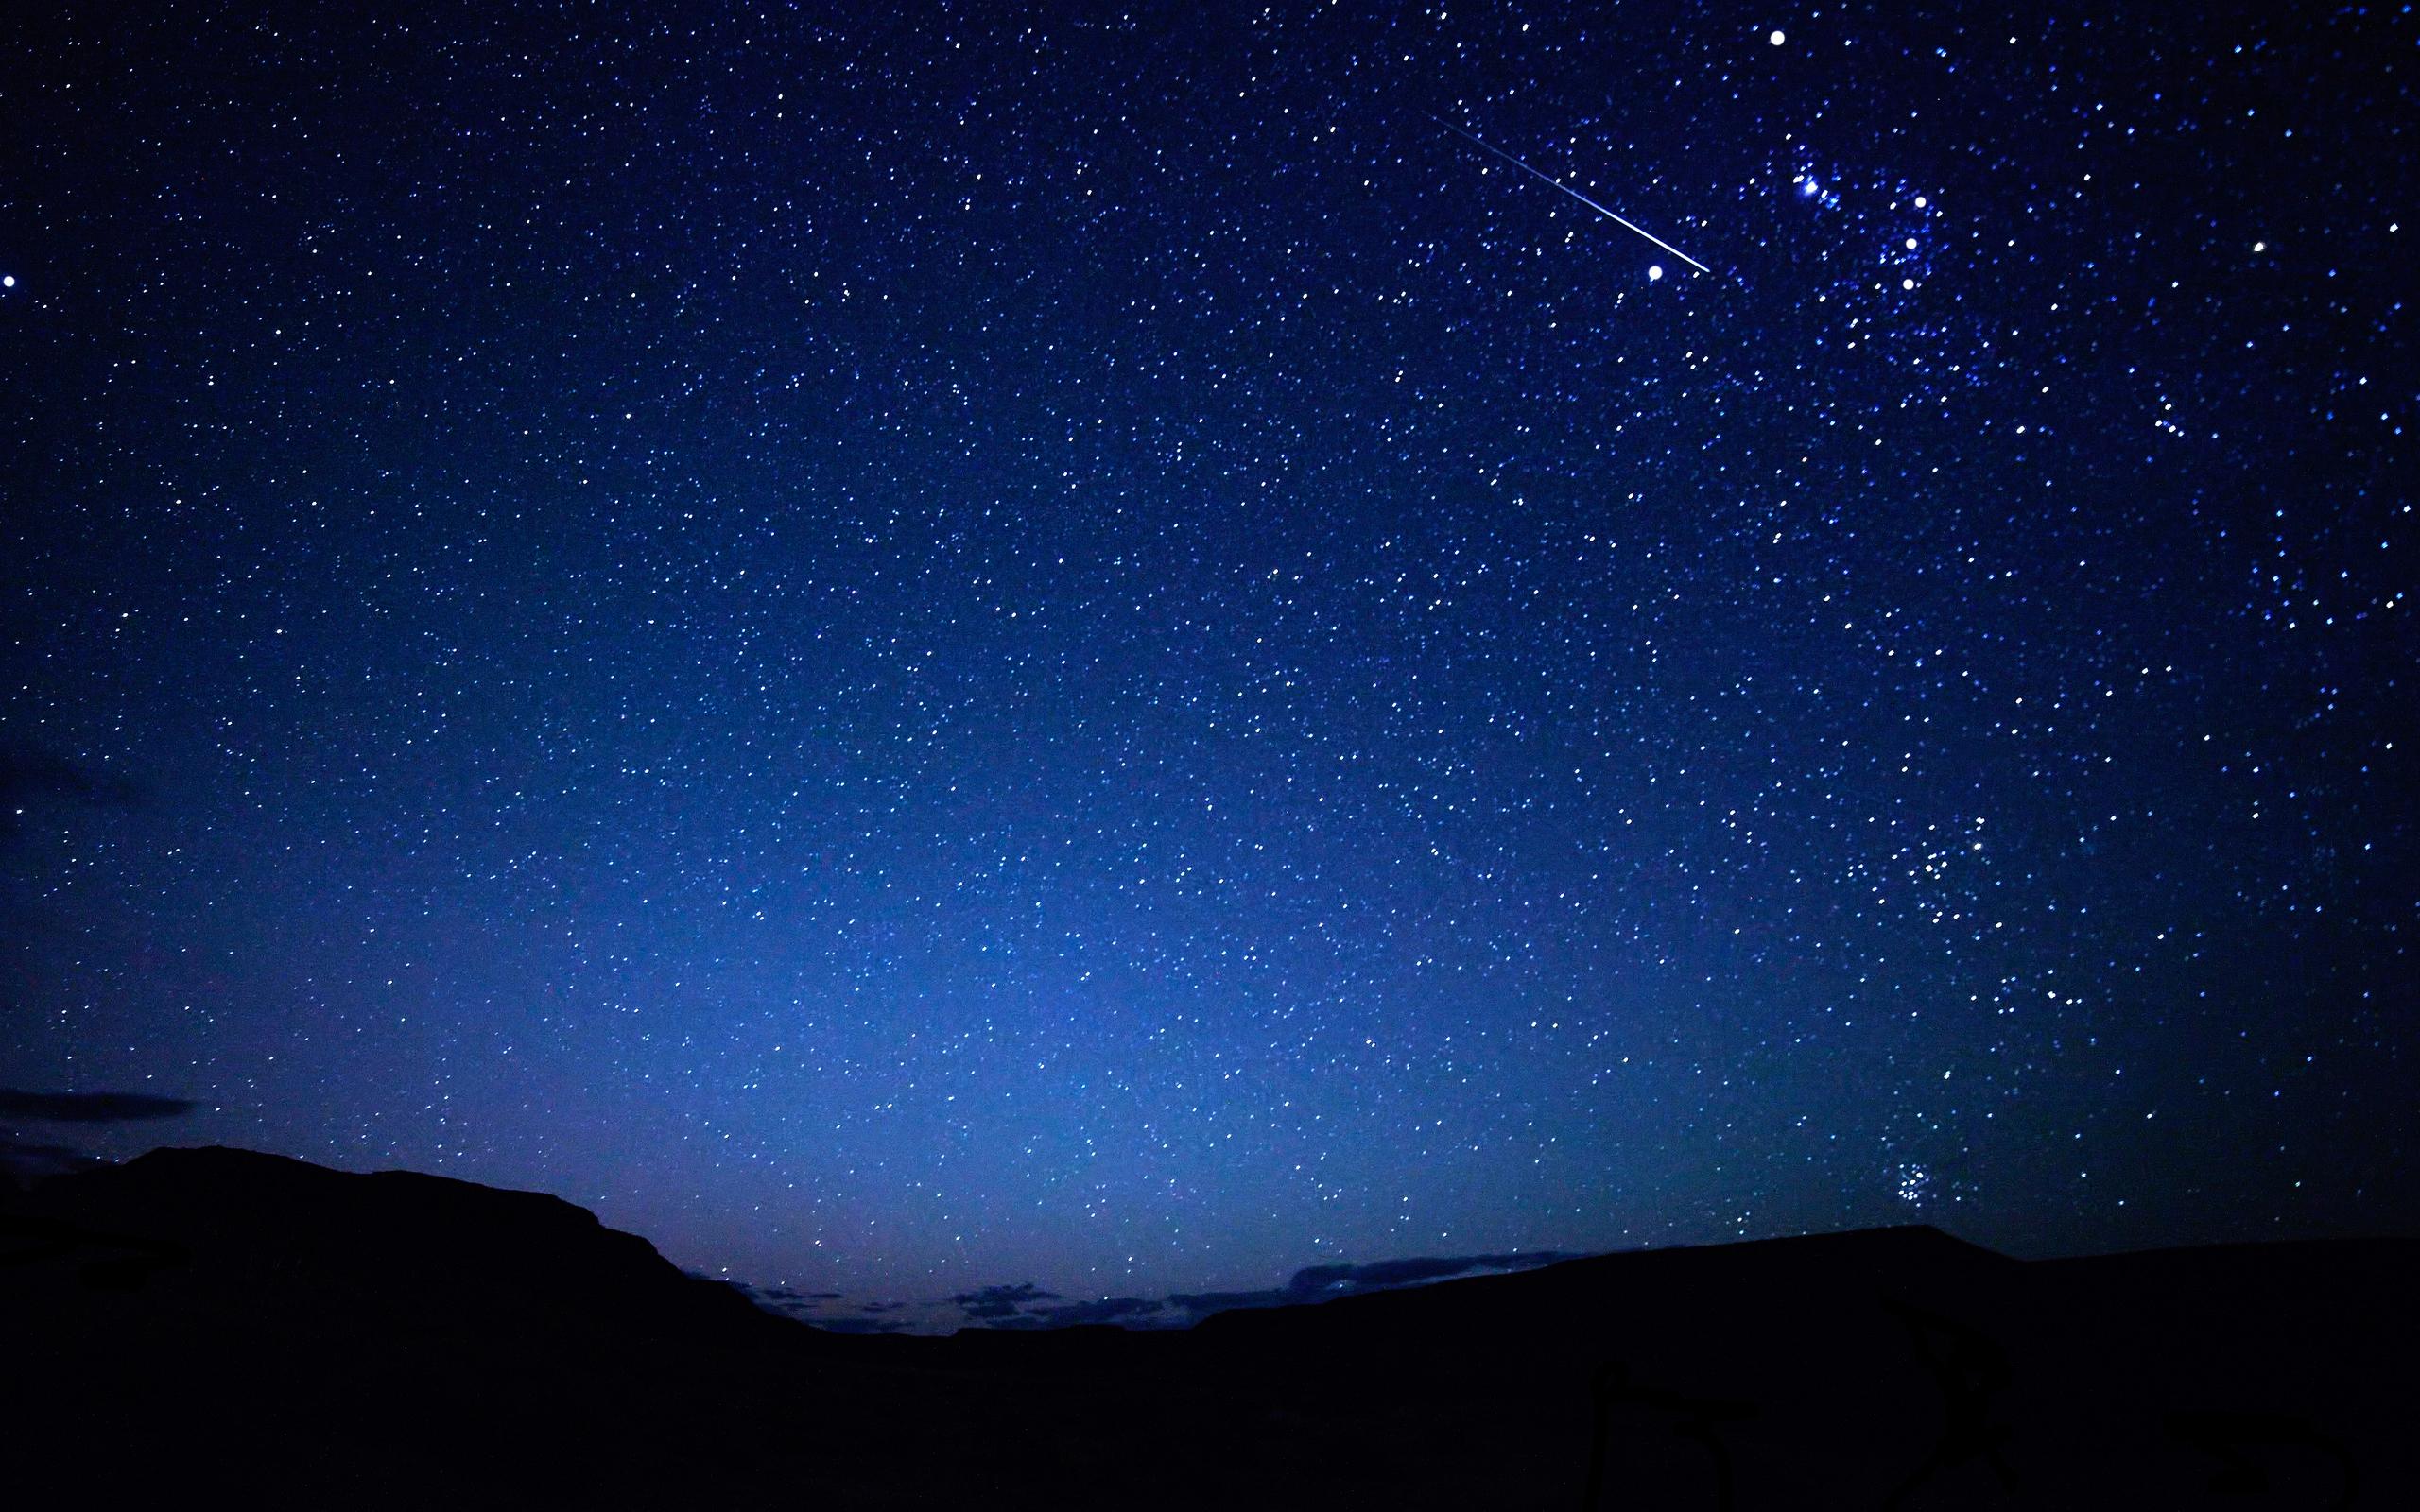 wallpaper stars nightnight sky hd wallpapers nature night sky 2560x1600